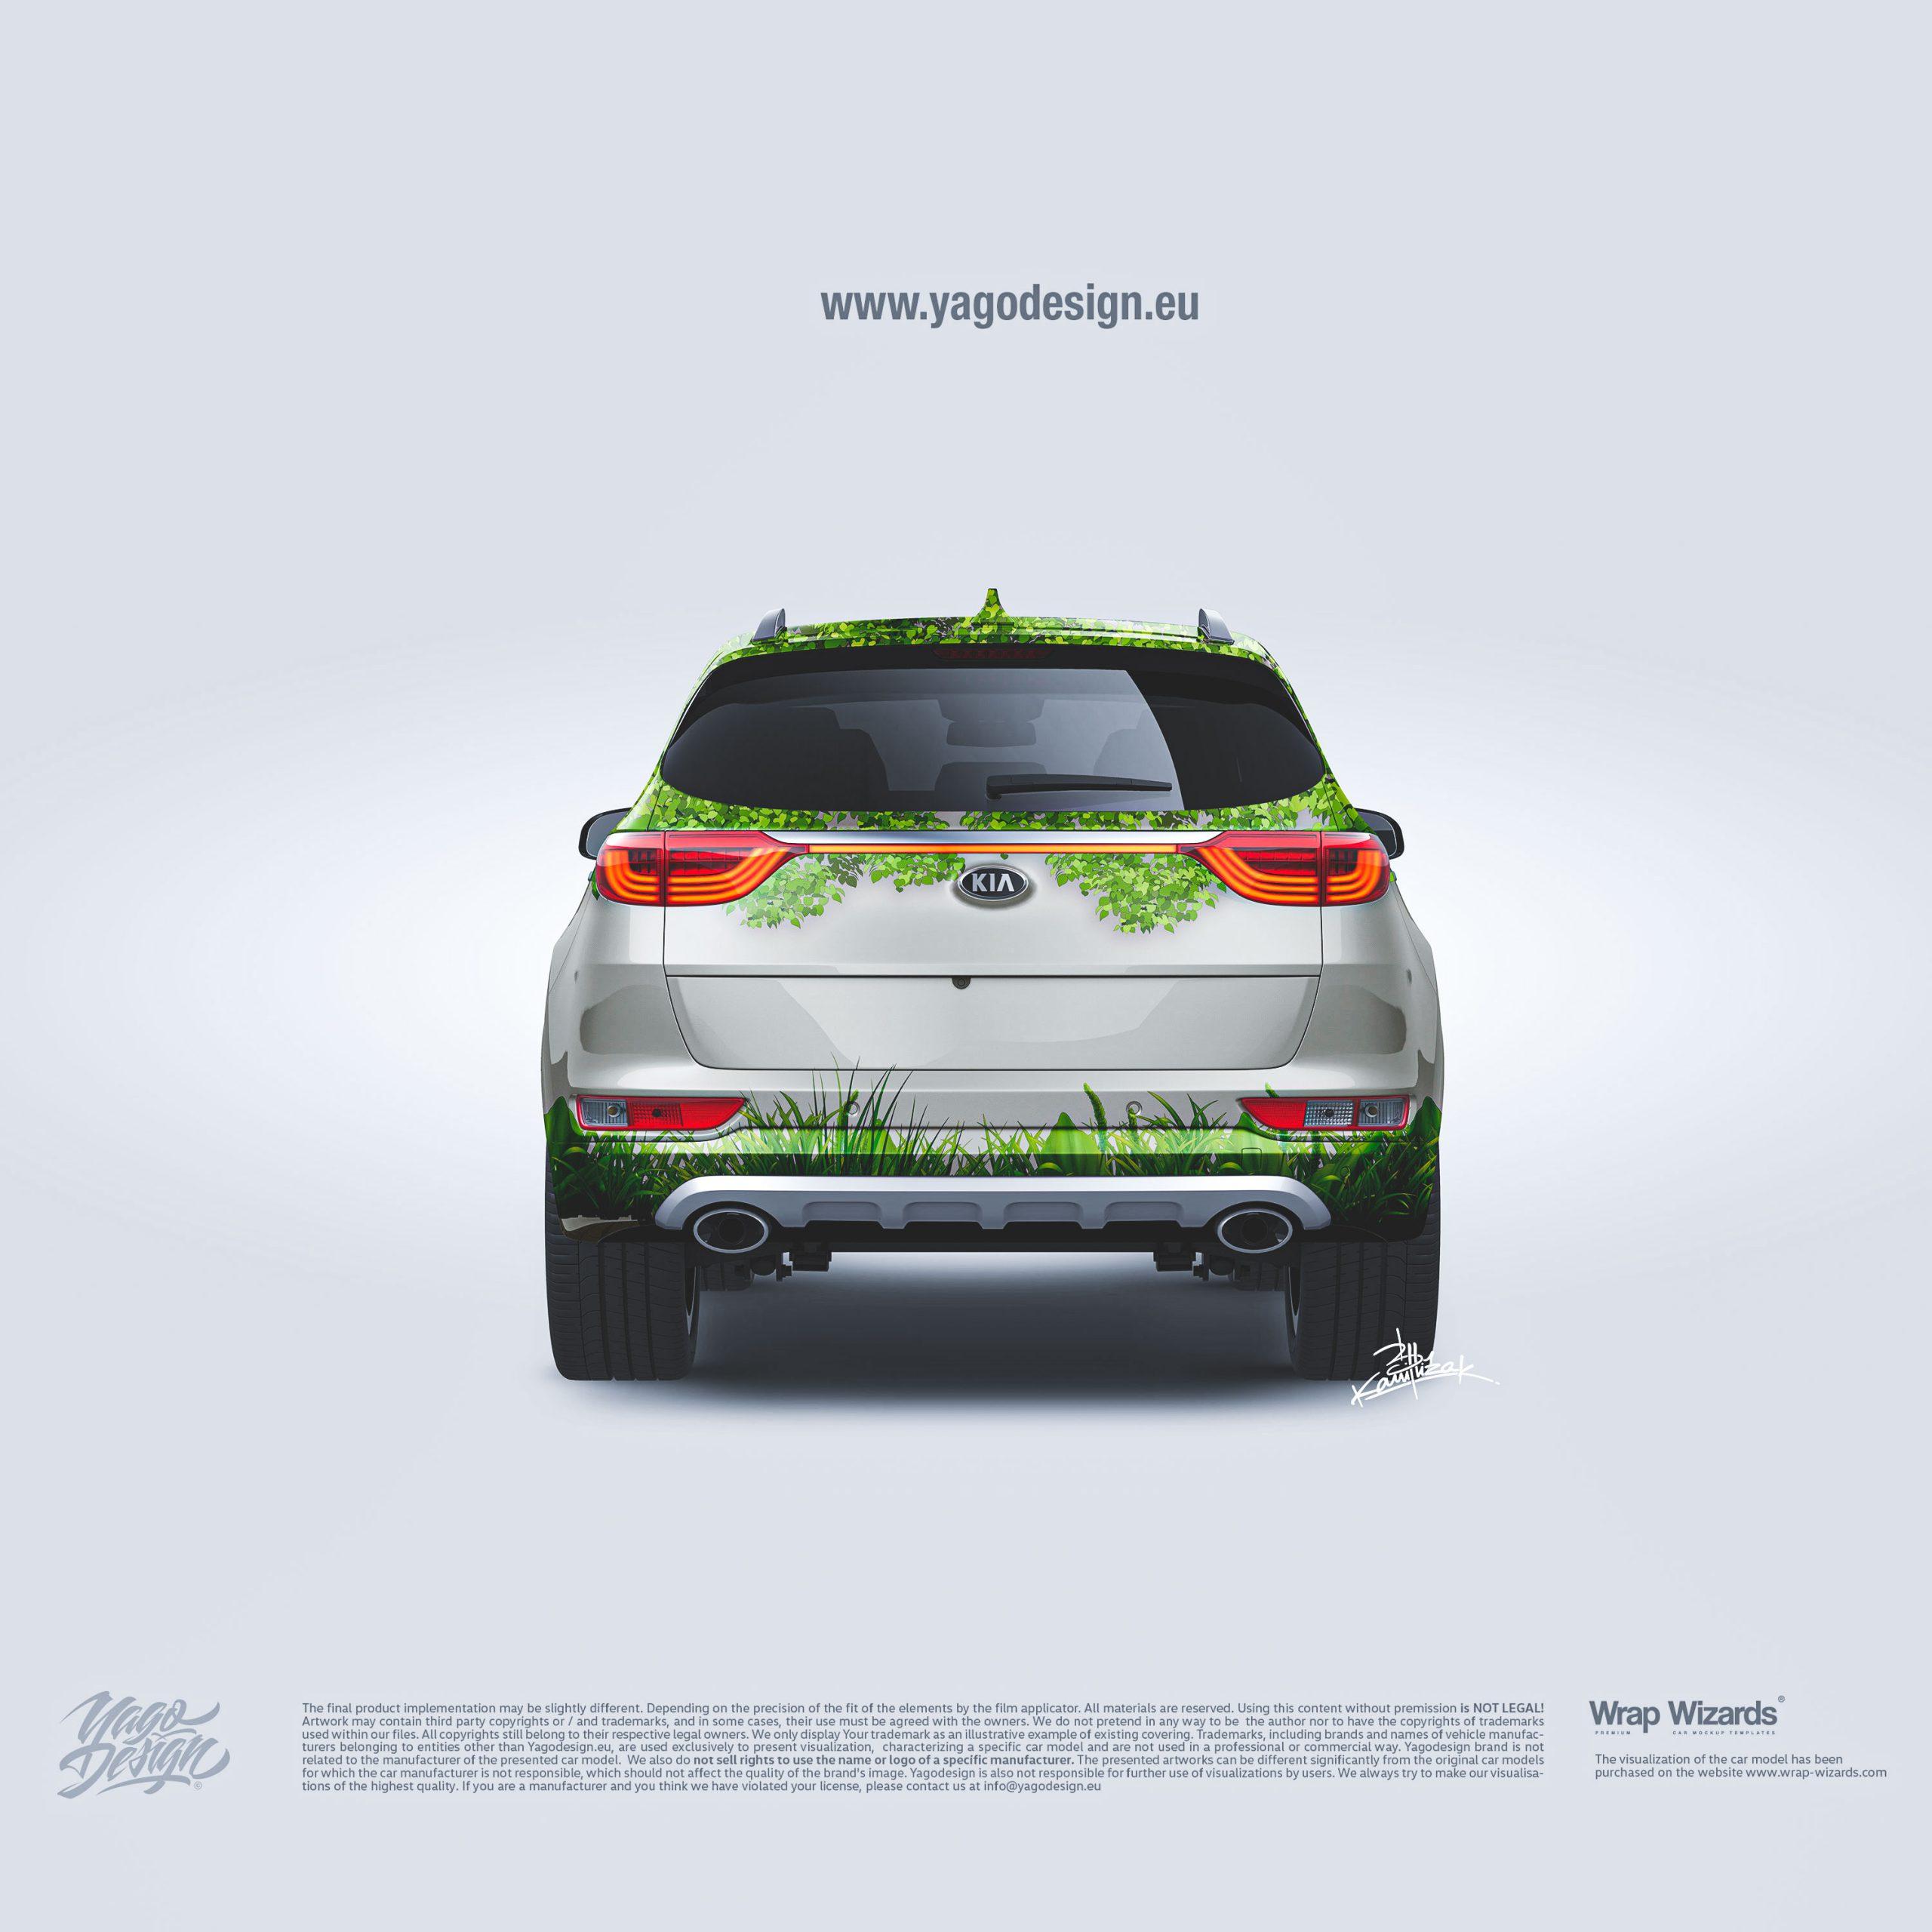 KIA-Sportage-2016-Livery-Design-By-Yagodesign-Automotive-Design-Studio-rear-view-scaled